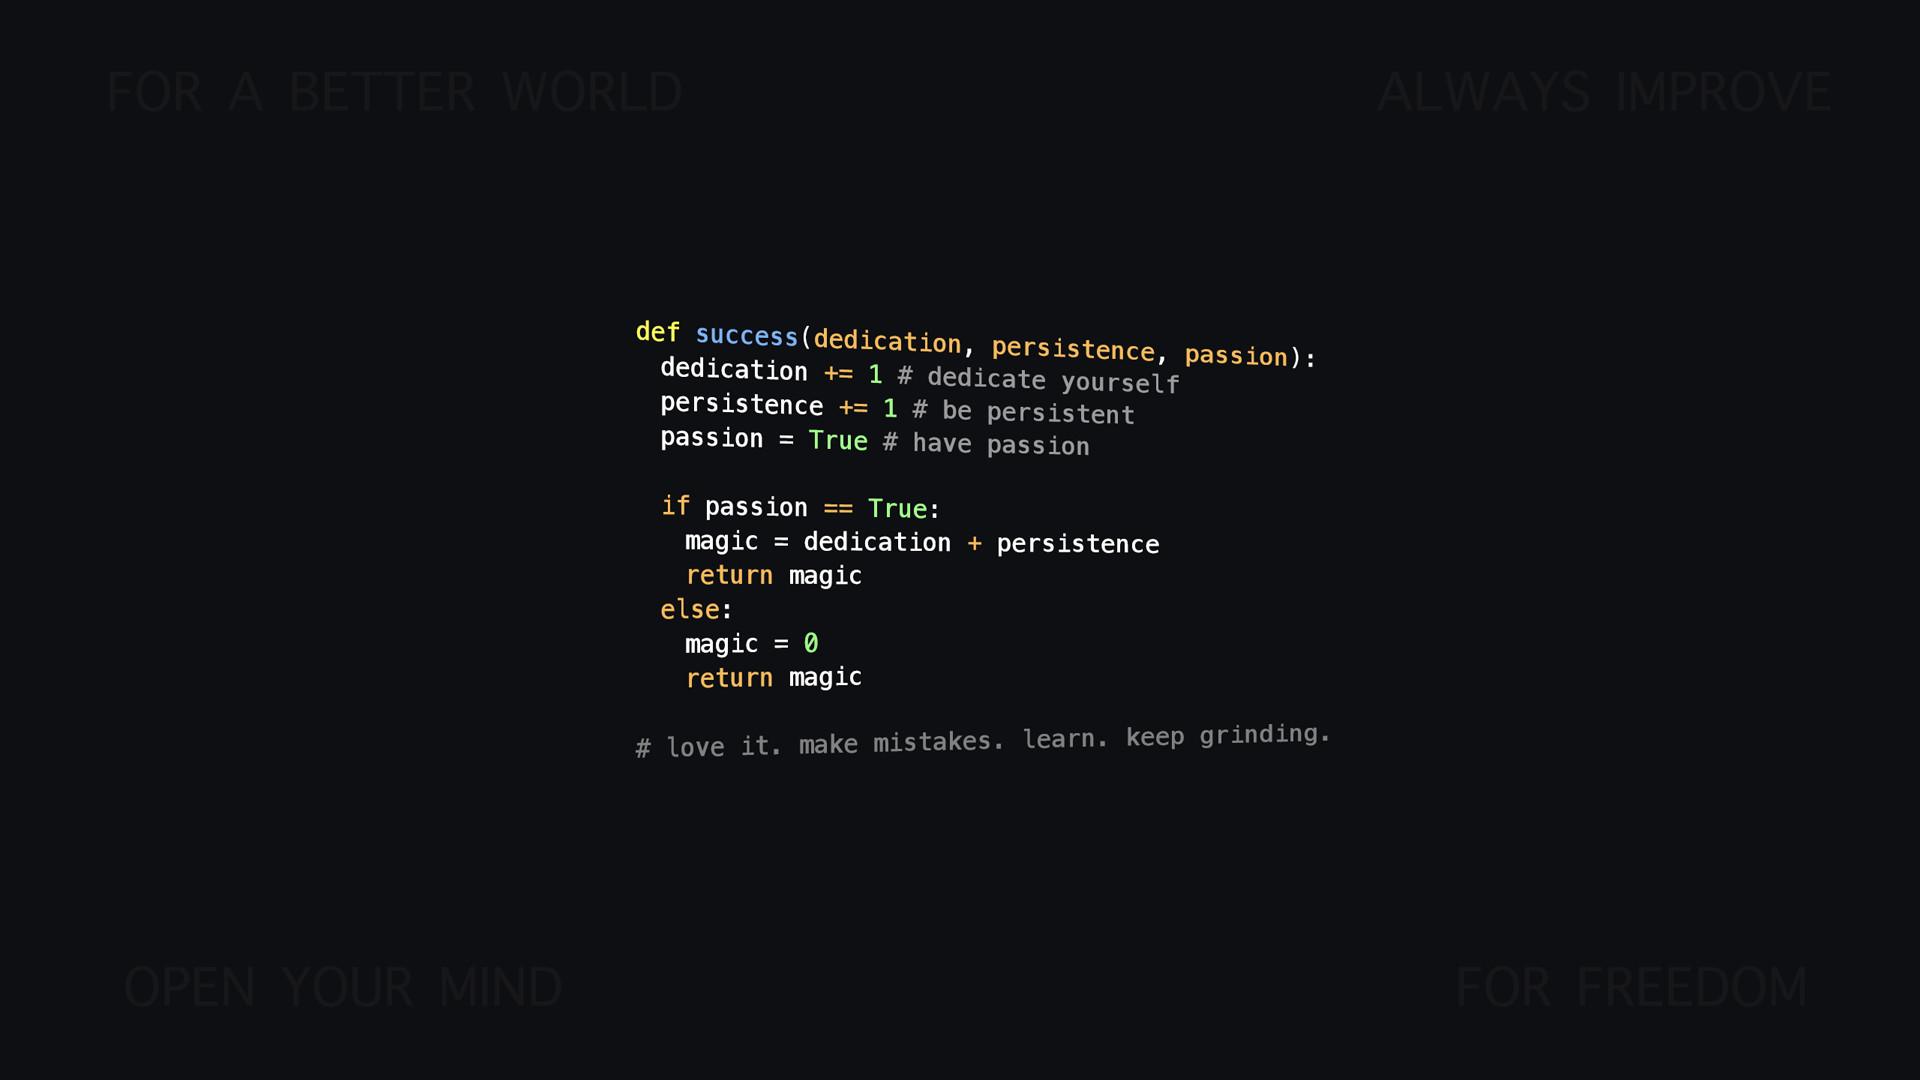 python programming wallpaper 72 images